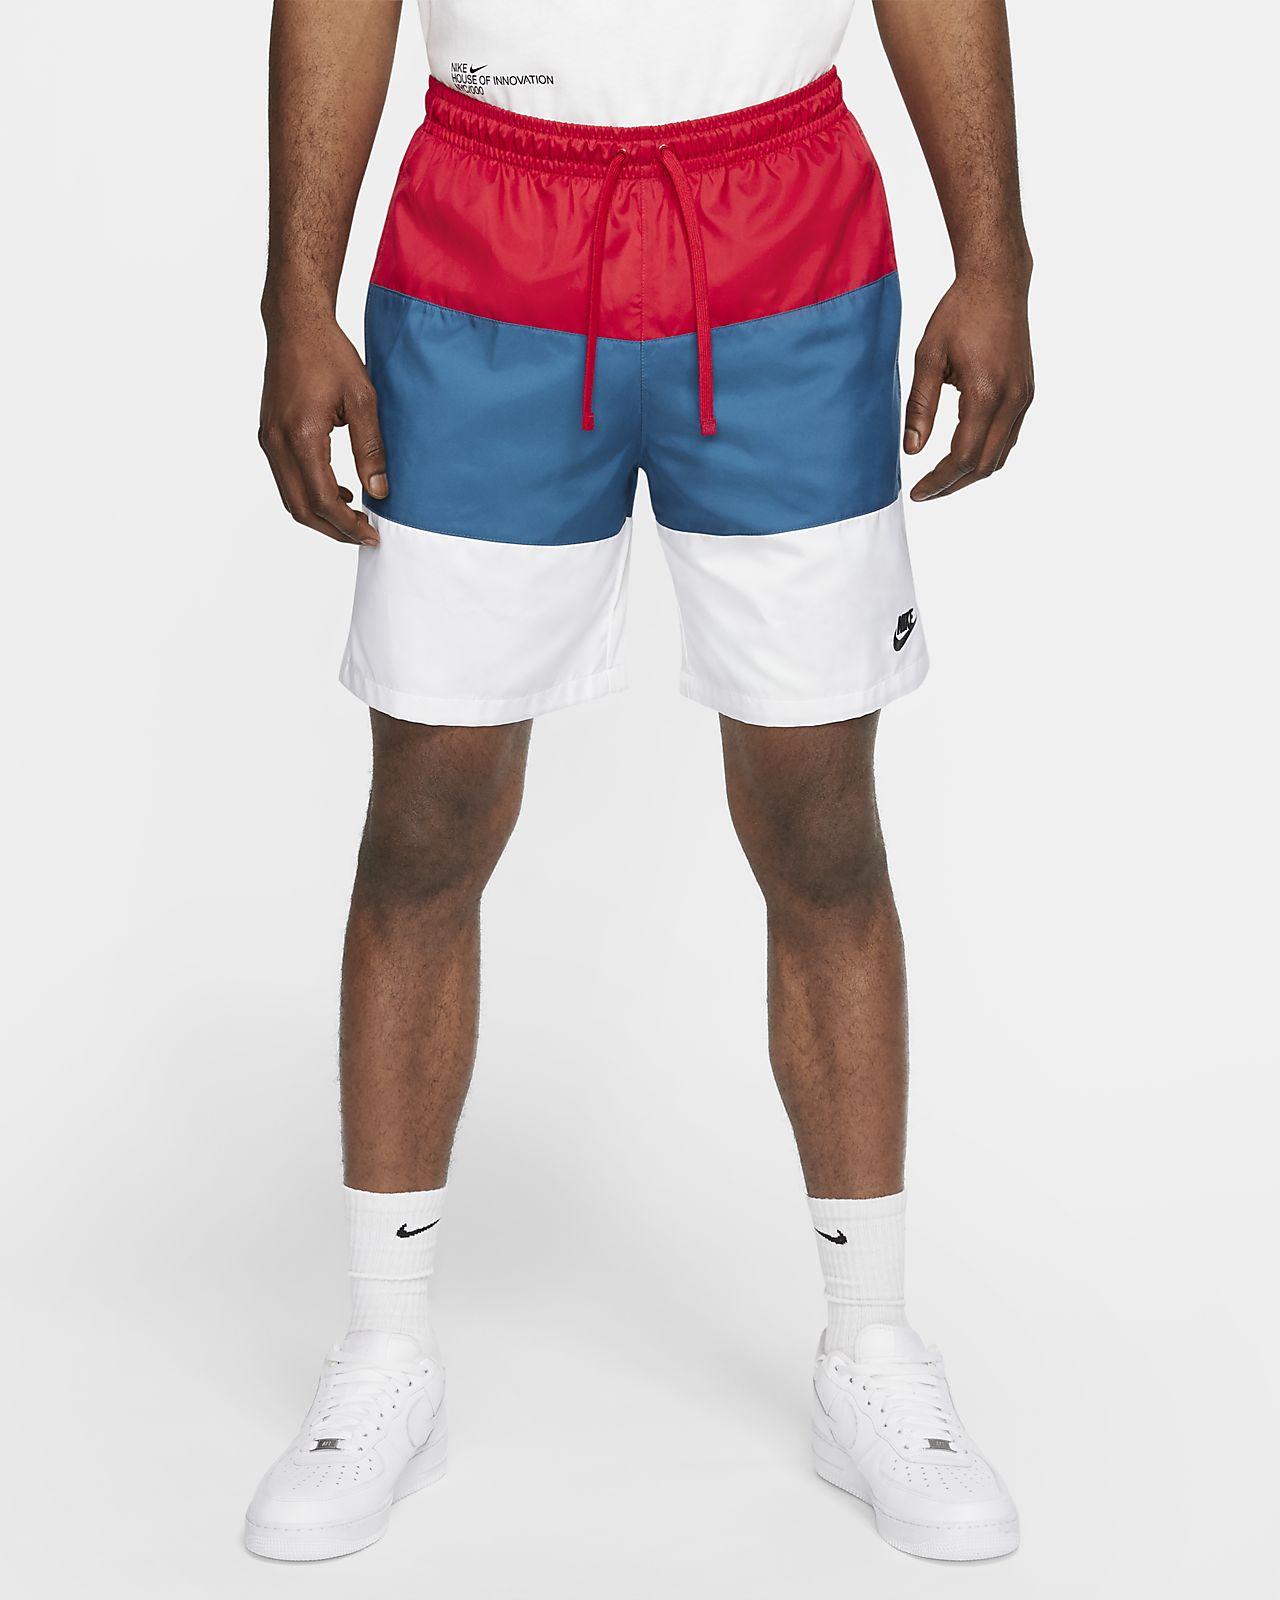 Shorts in woven Nike Sportswear City Edition - Uomo